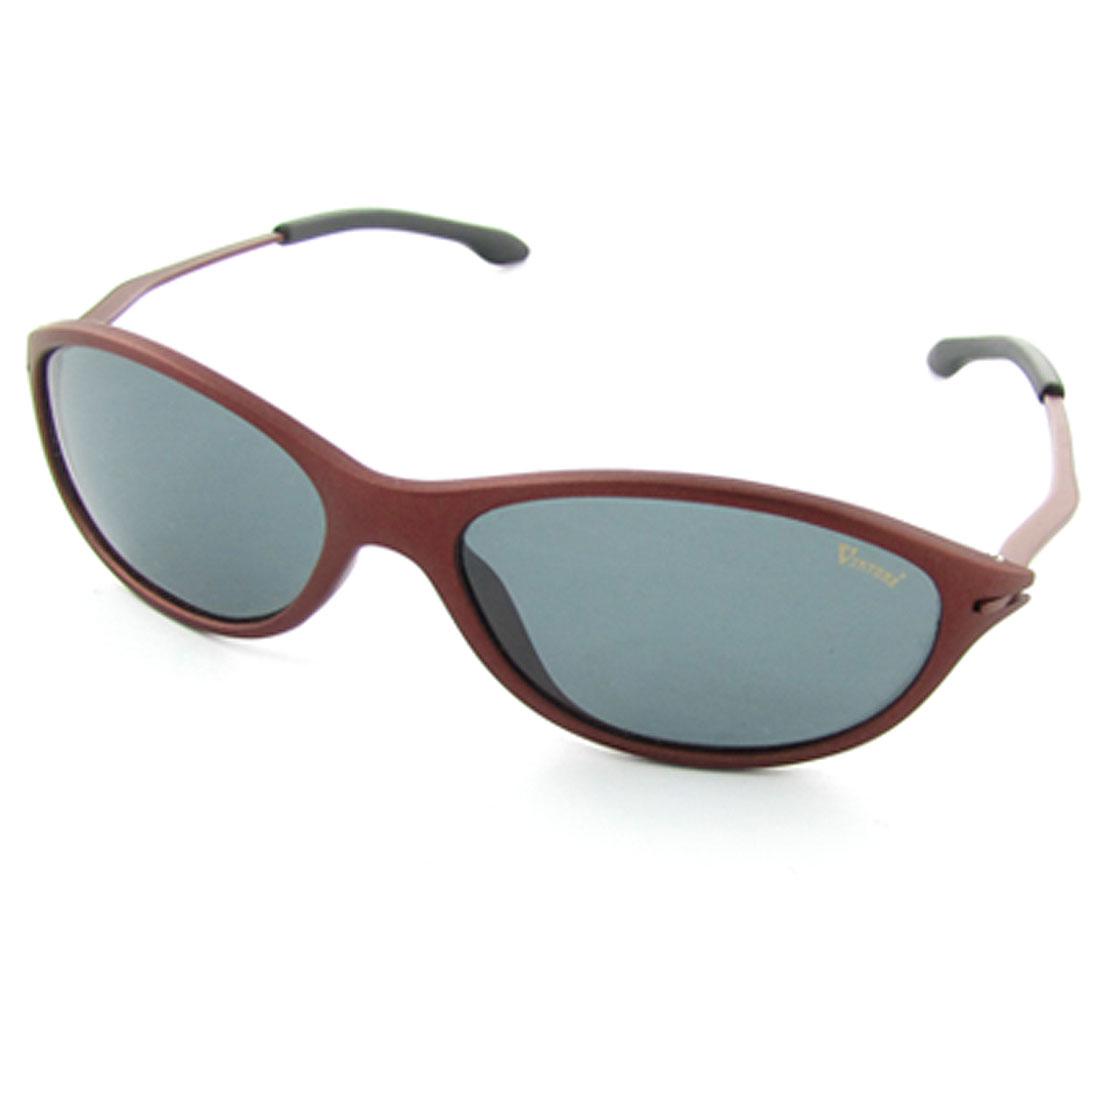 Dark Red Rubberized Metal Full Frame Polarized Sunglasses w Case